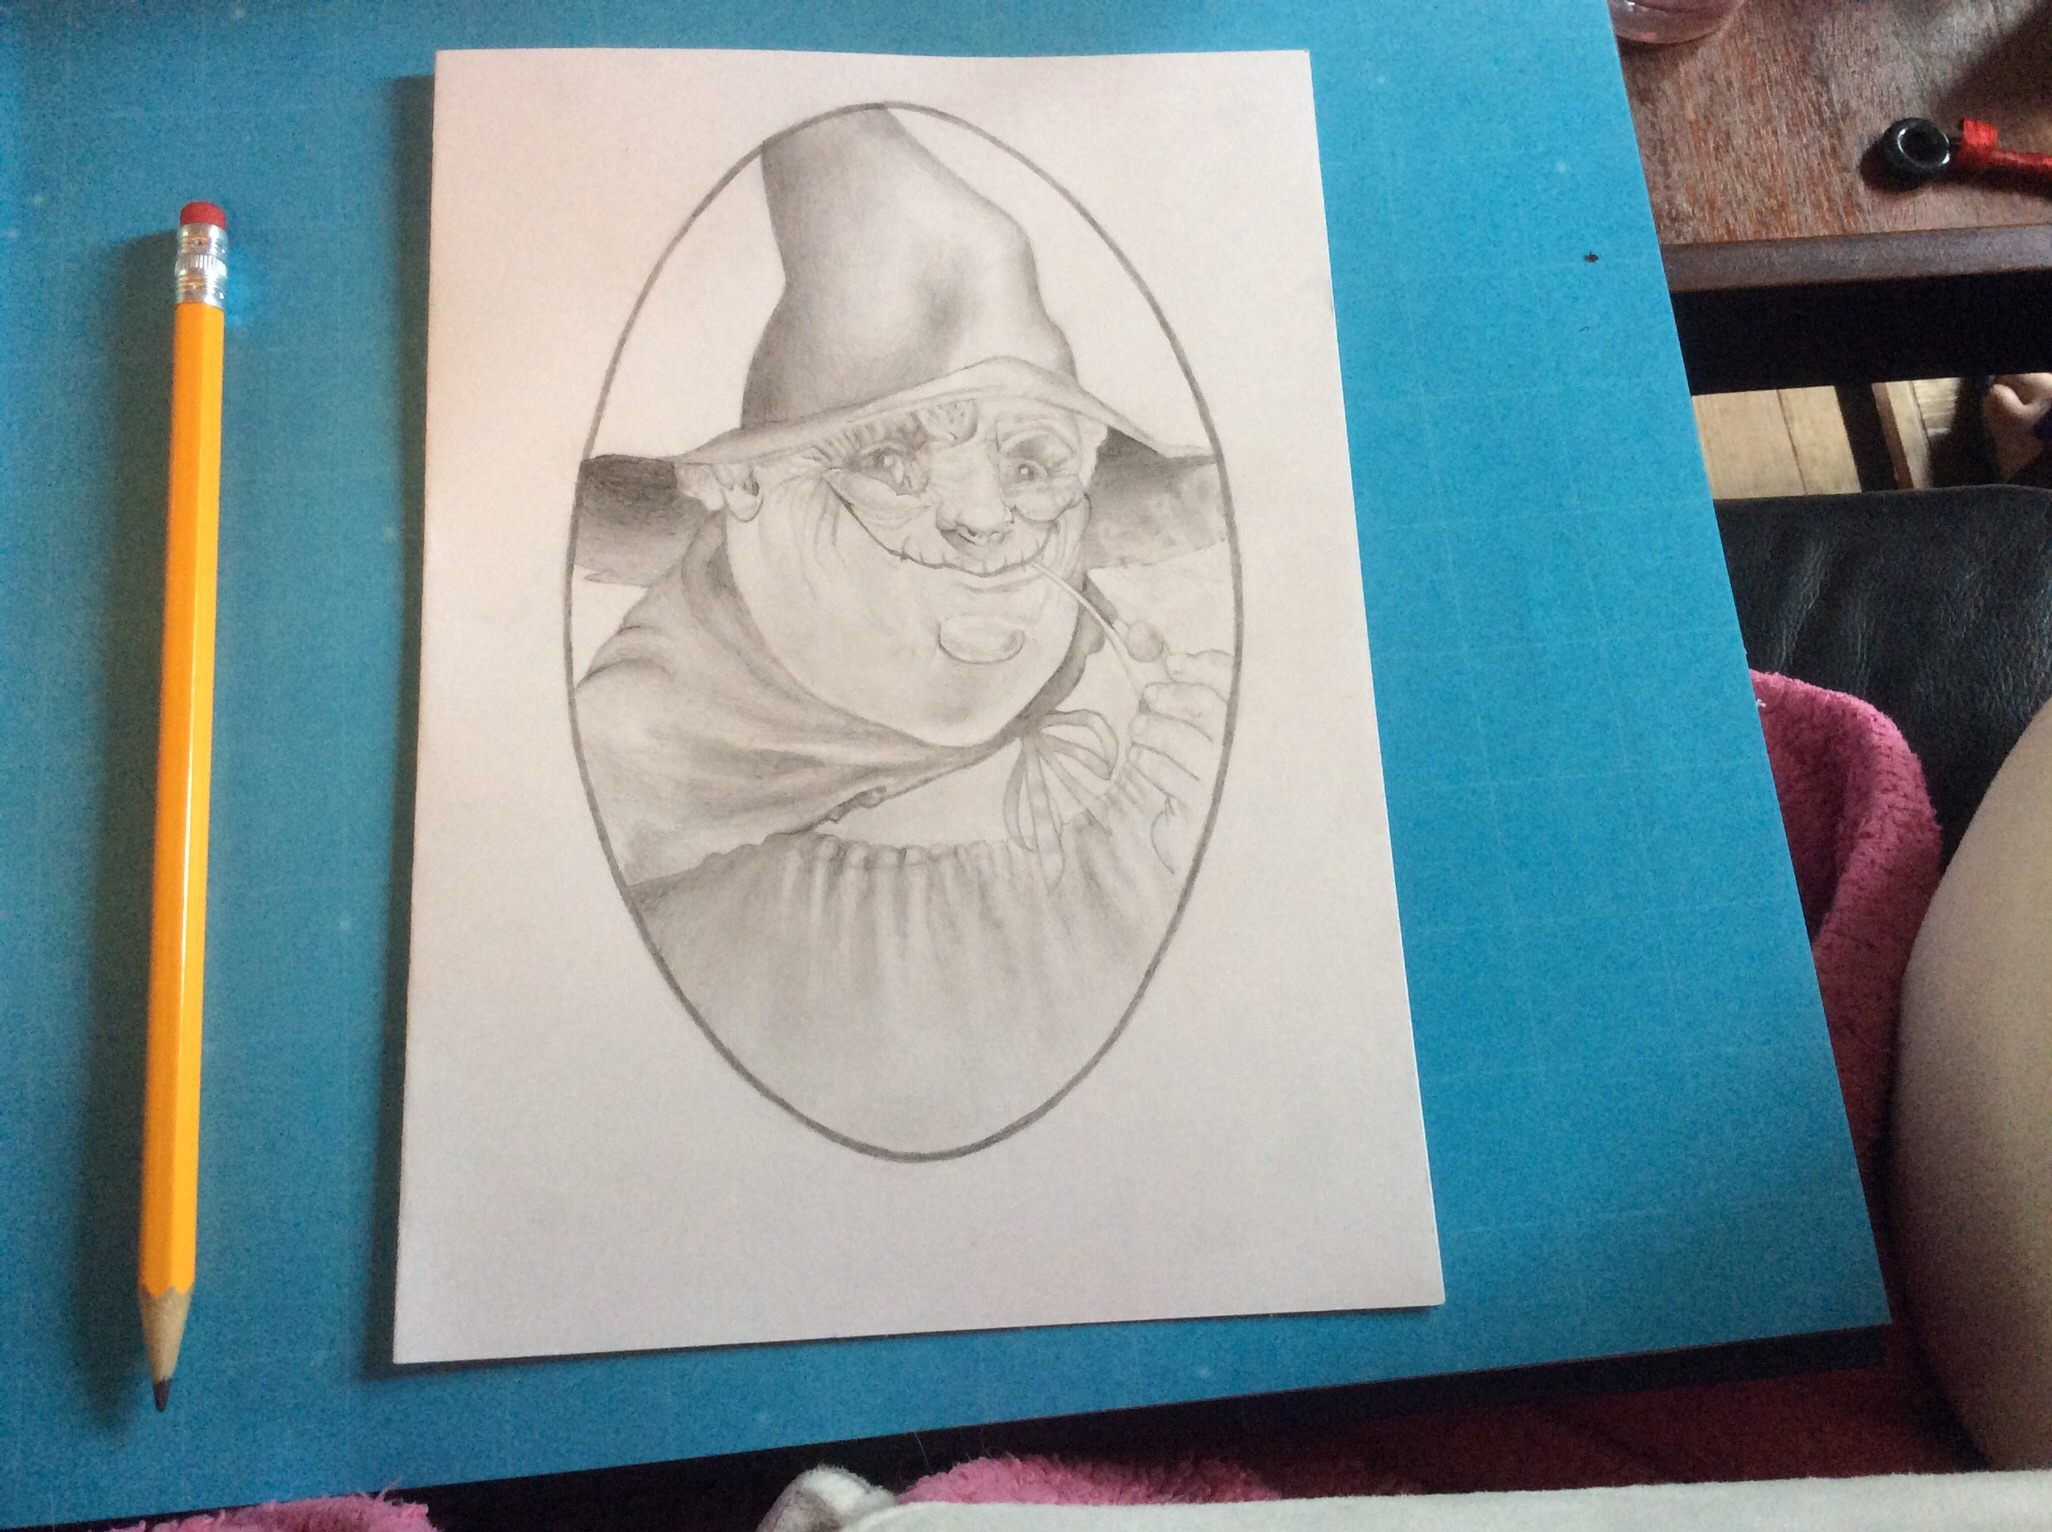 My drawing of Nanny Ogg. :)